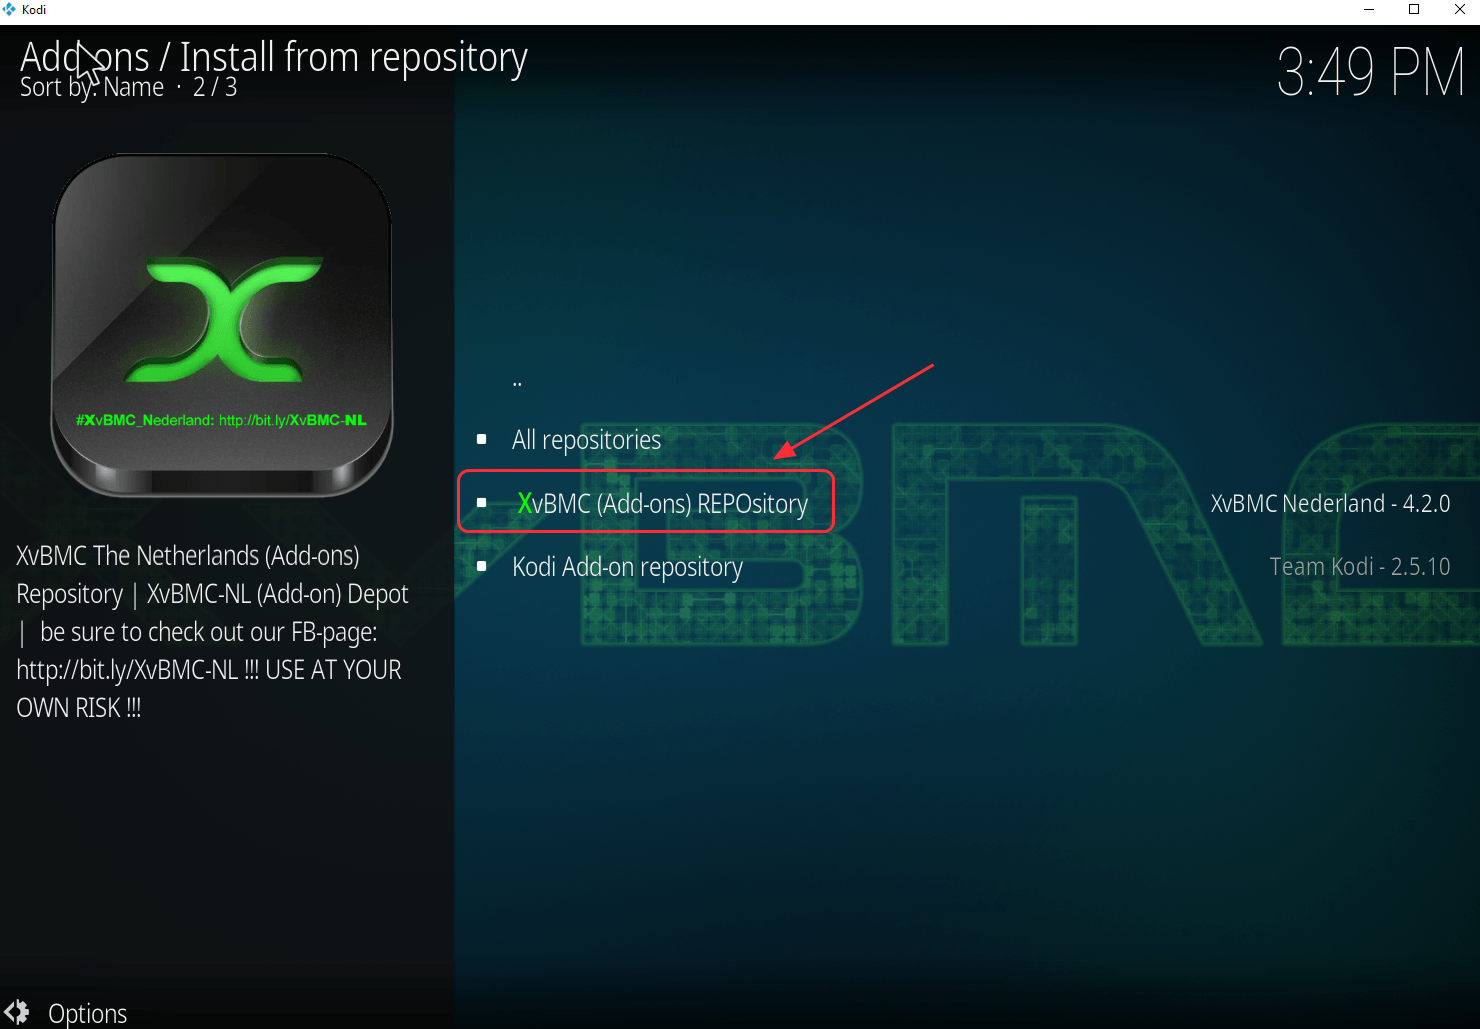 How to Install Kodi on Windows 10 - Driver Easy